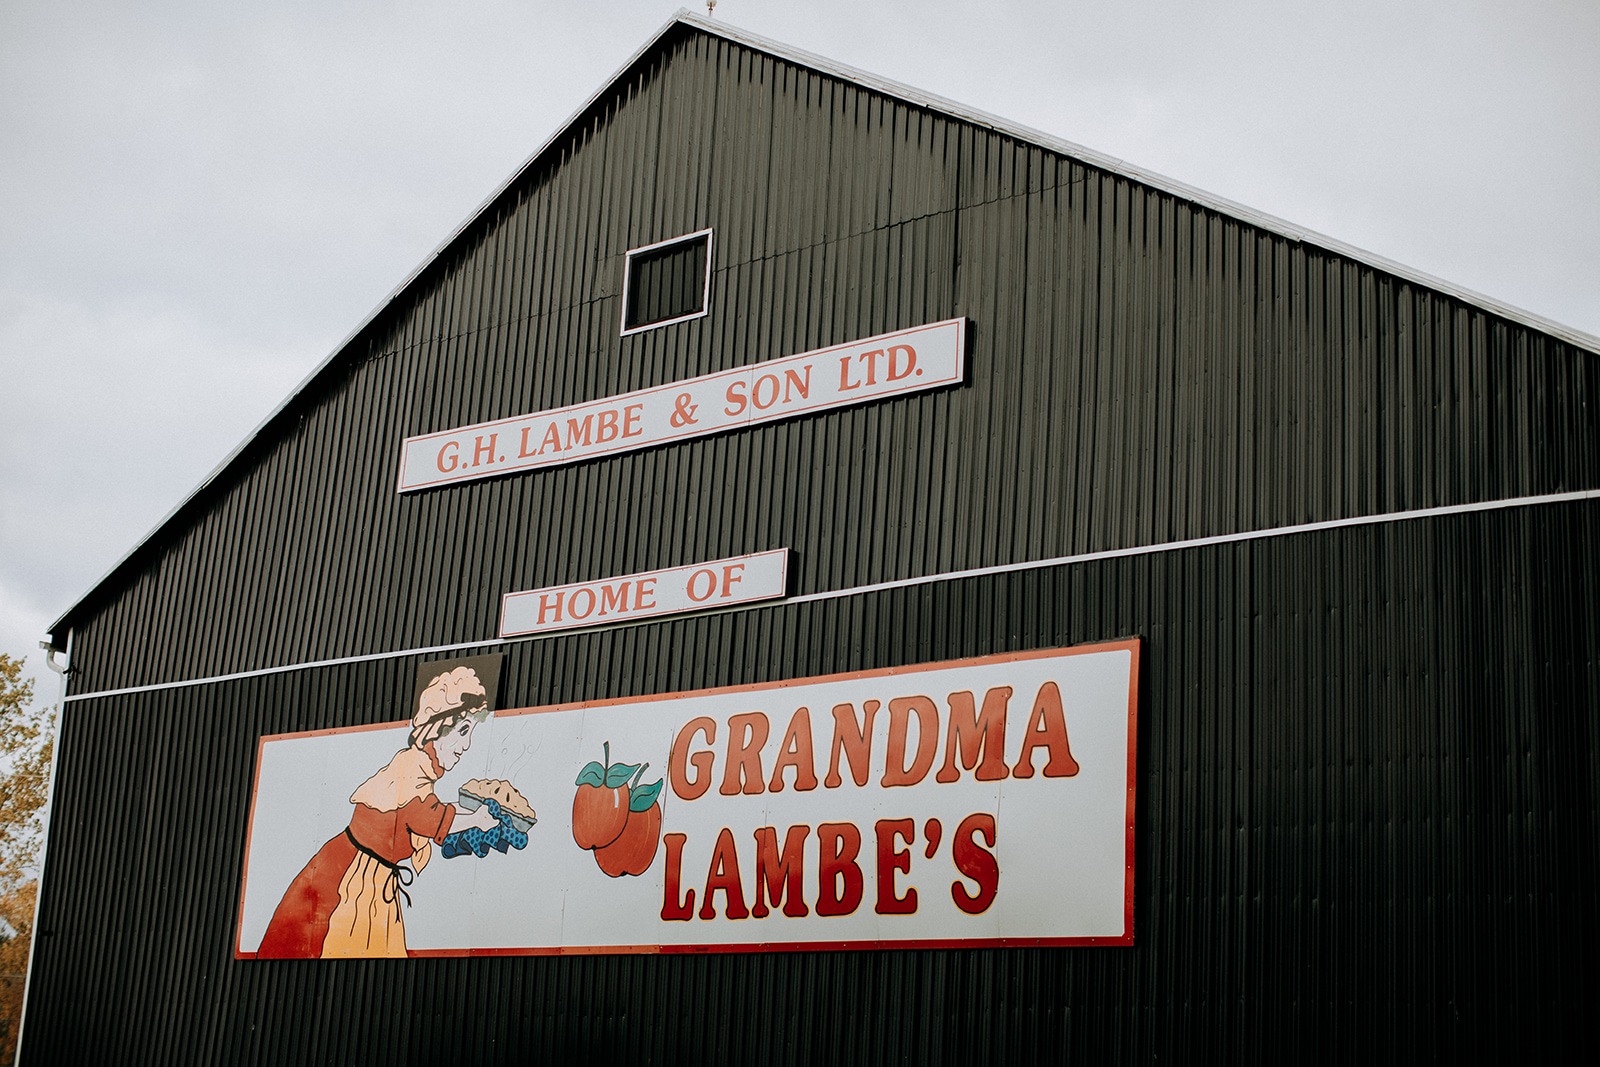 grandma-lambes-jvs-394.jpg